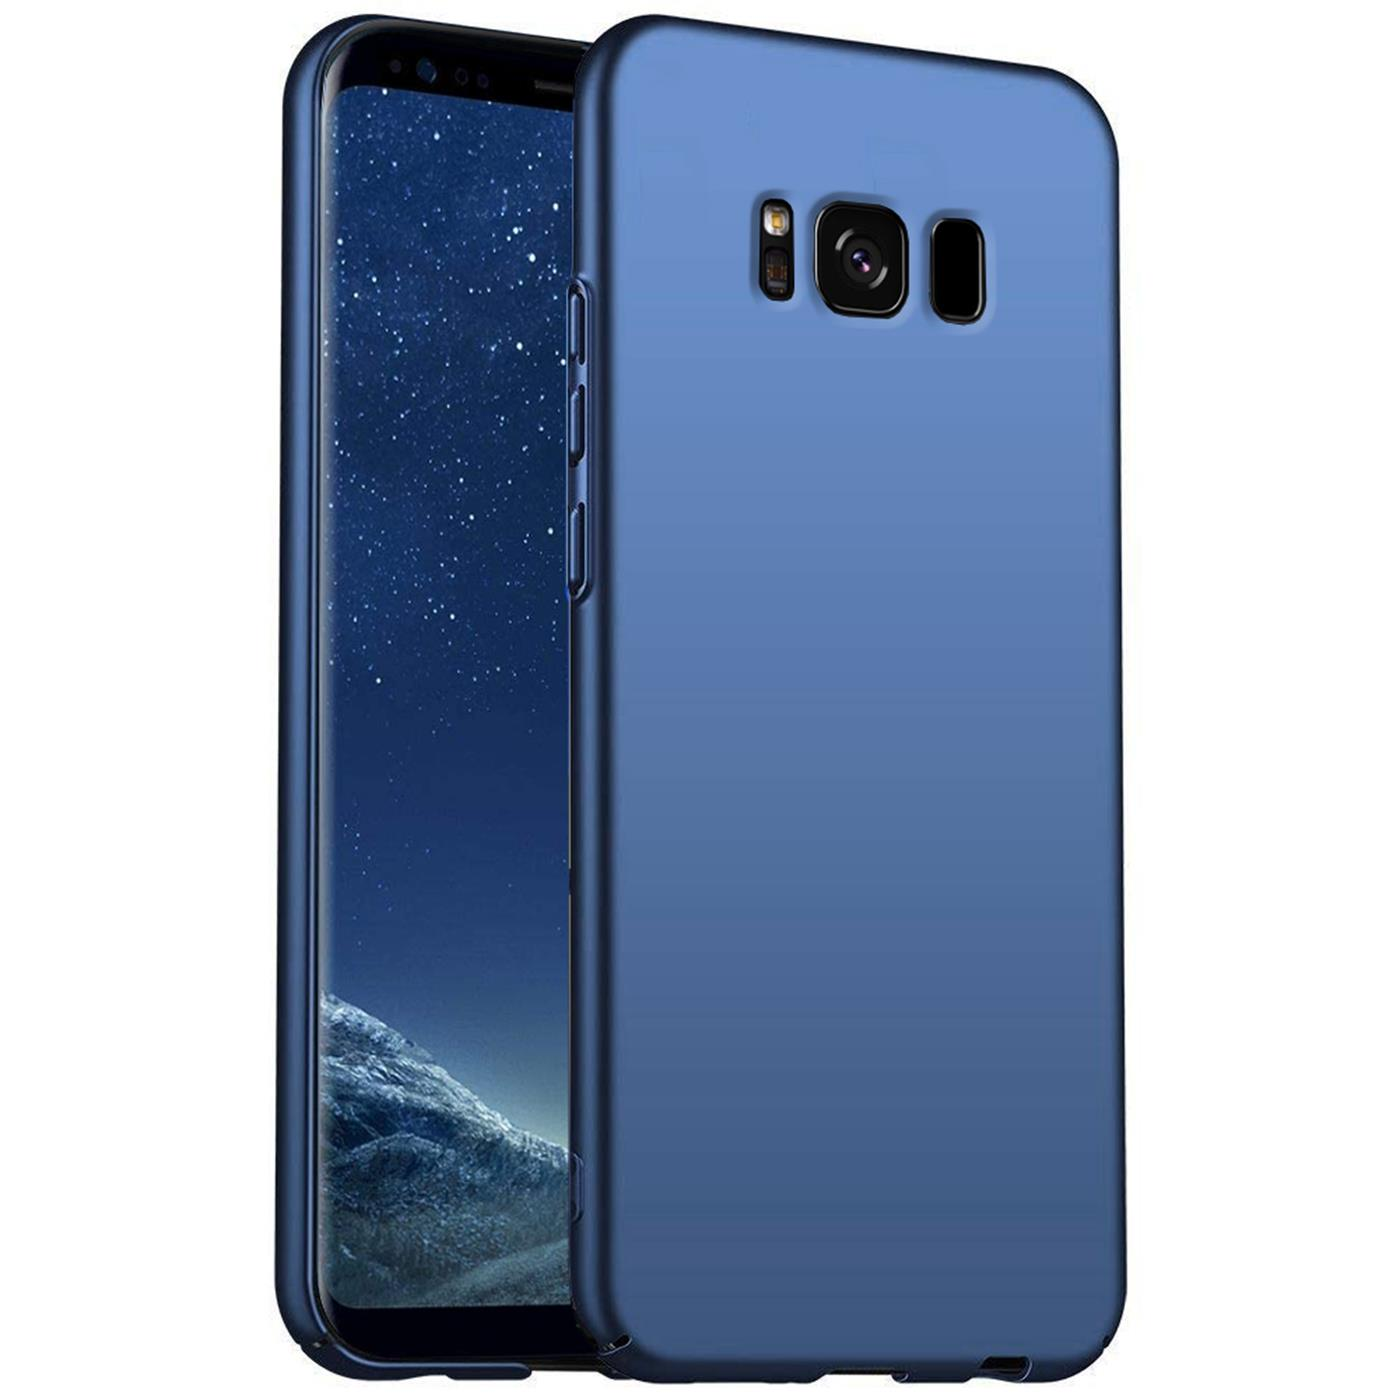 Hard-Back-Case-Cover-Samsung-Galaxy-s4-duenn-Cover-Slim-Shockproof-Rugged Indexbild 10